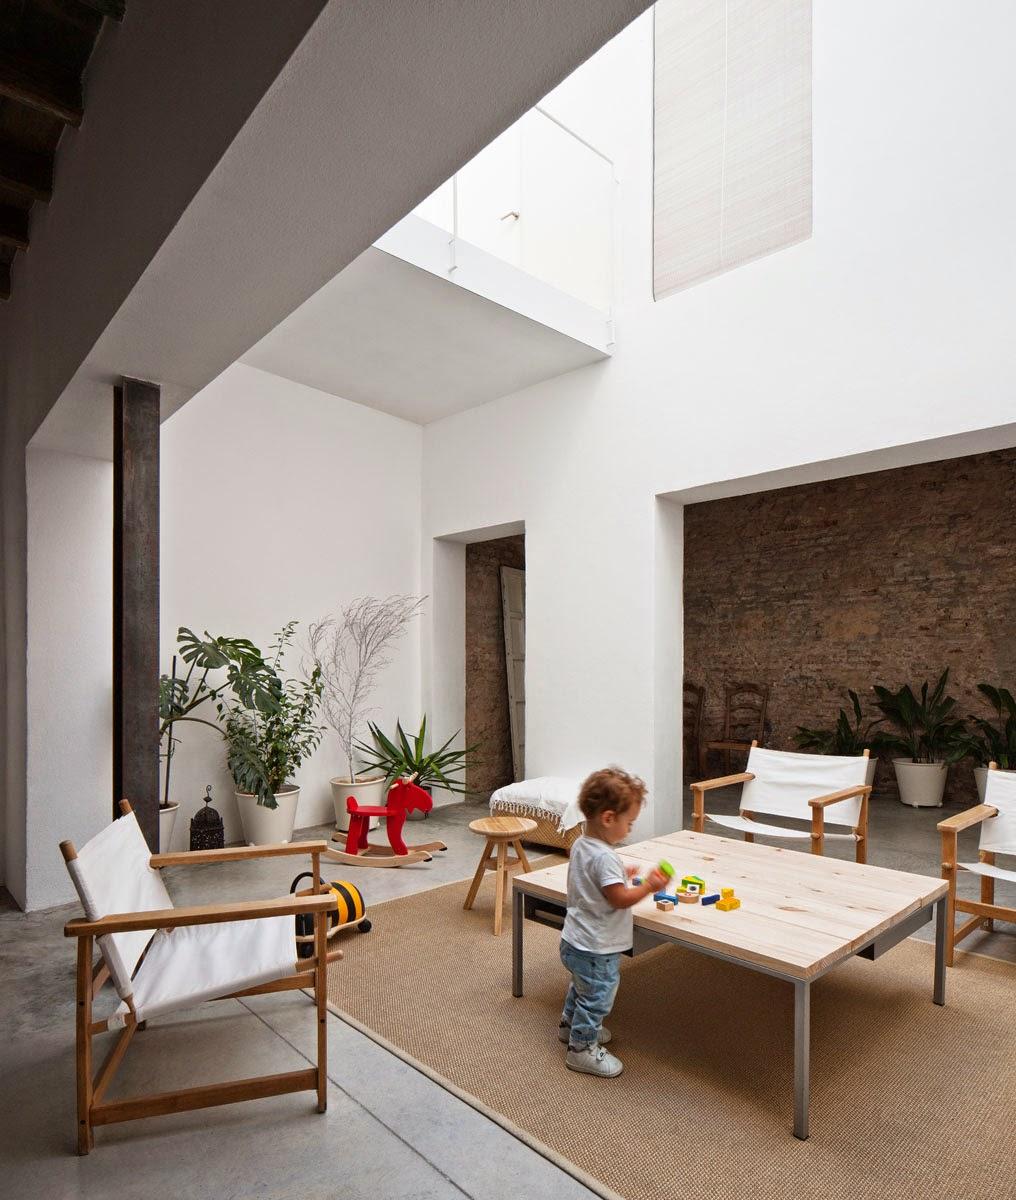 Casa en torno a un patio sol studio for Servicio tecnico jane sevilla calle feria